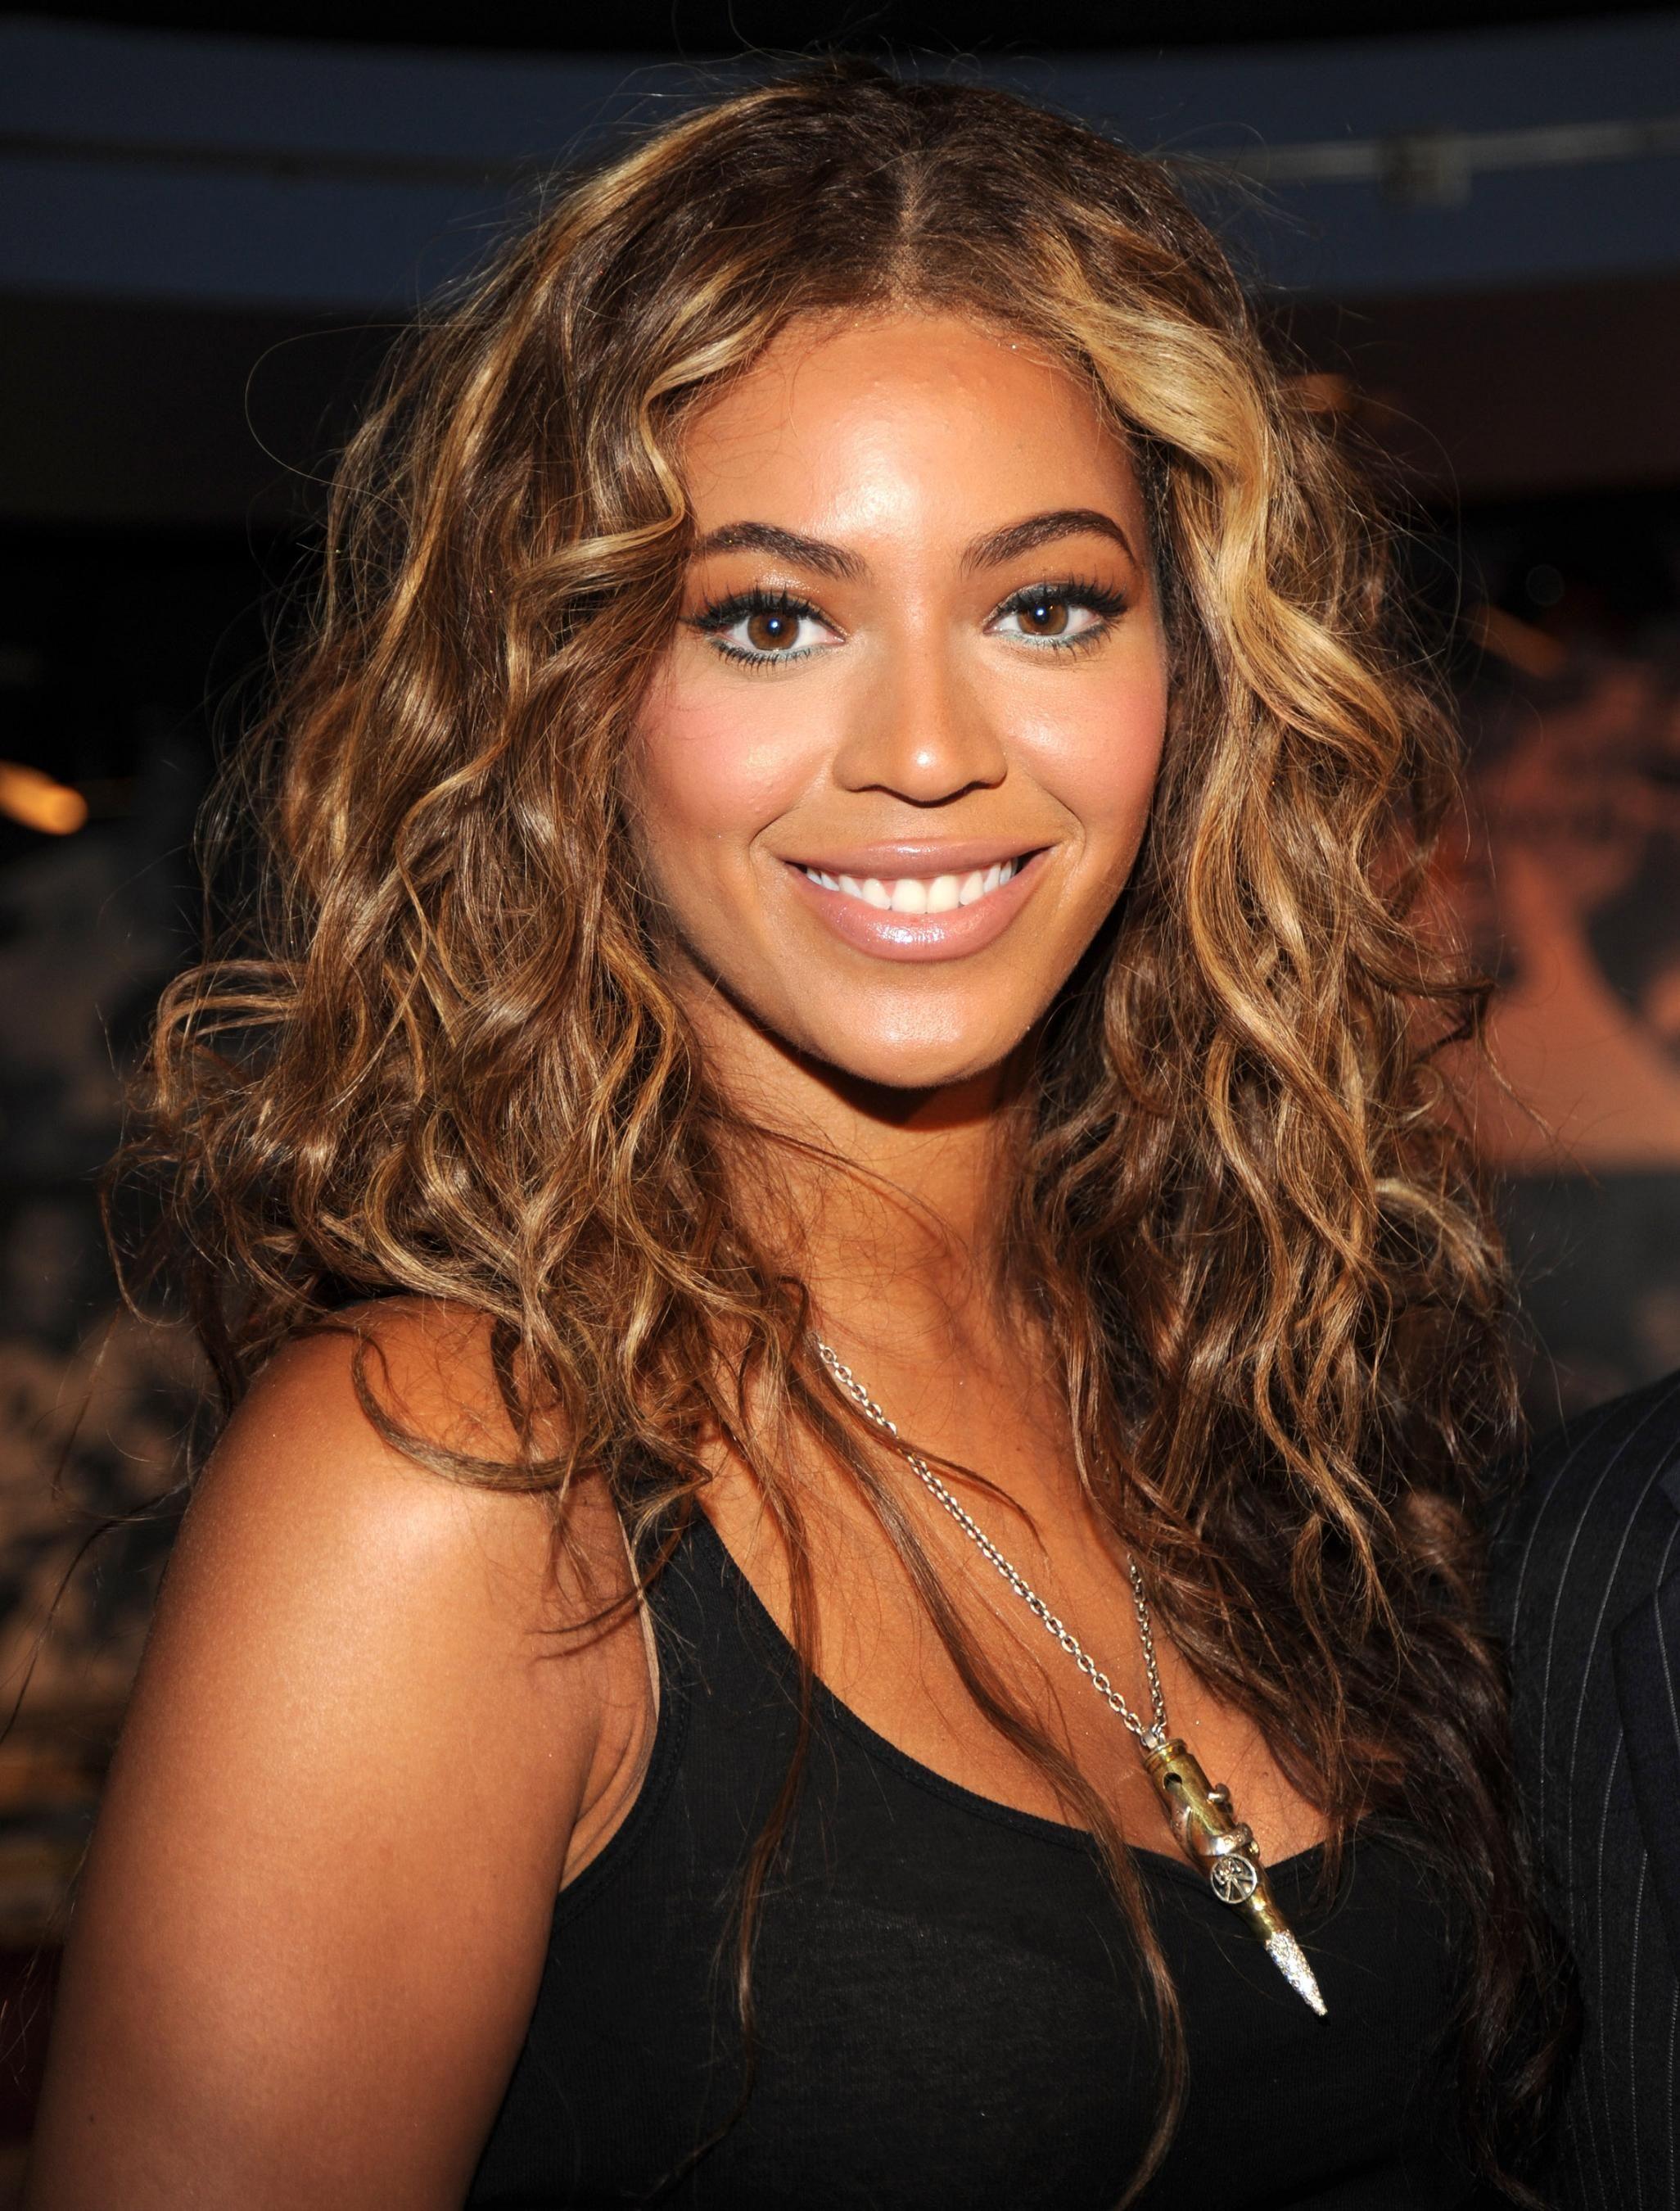 beyonce--highlighted curls | hair & makeup | pinterest | hair